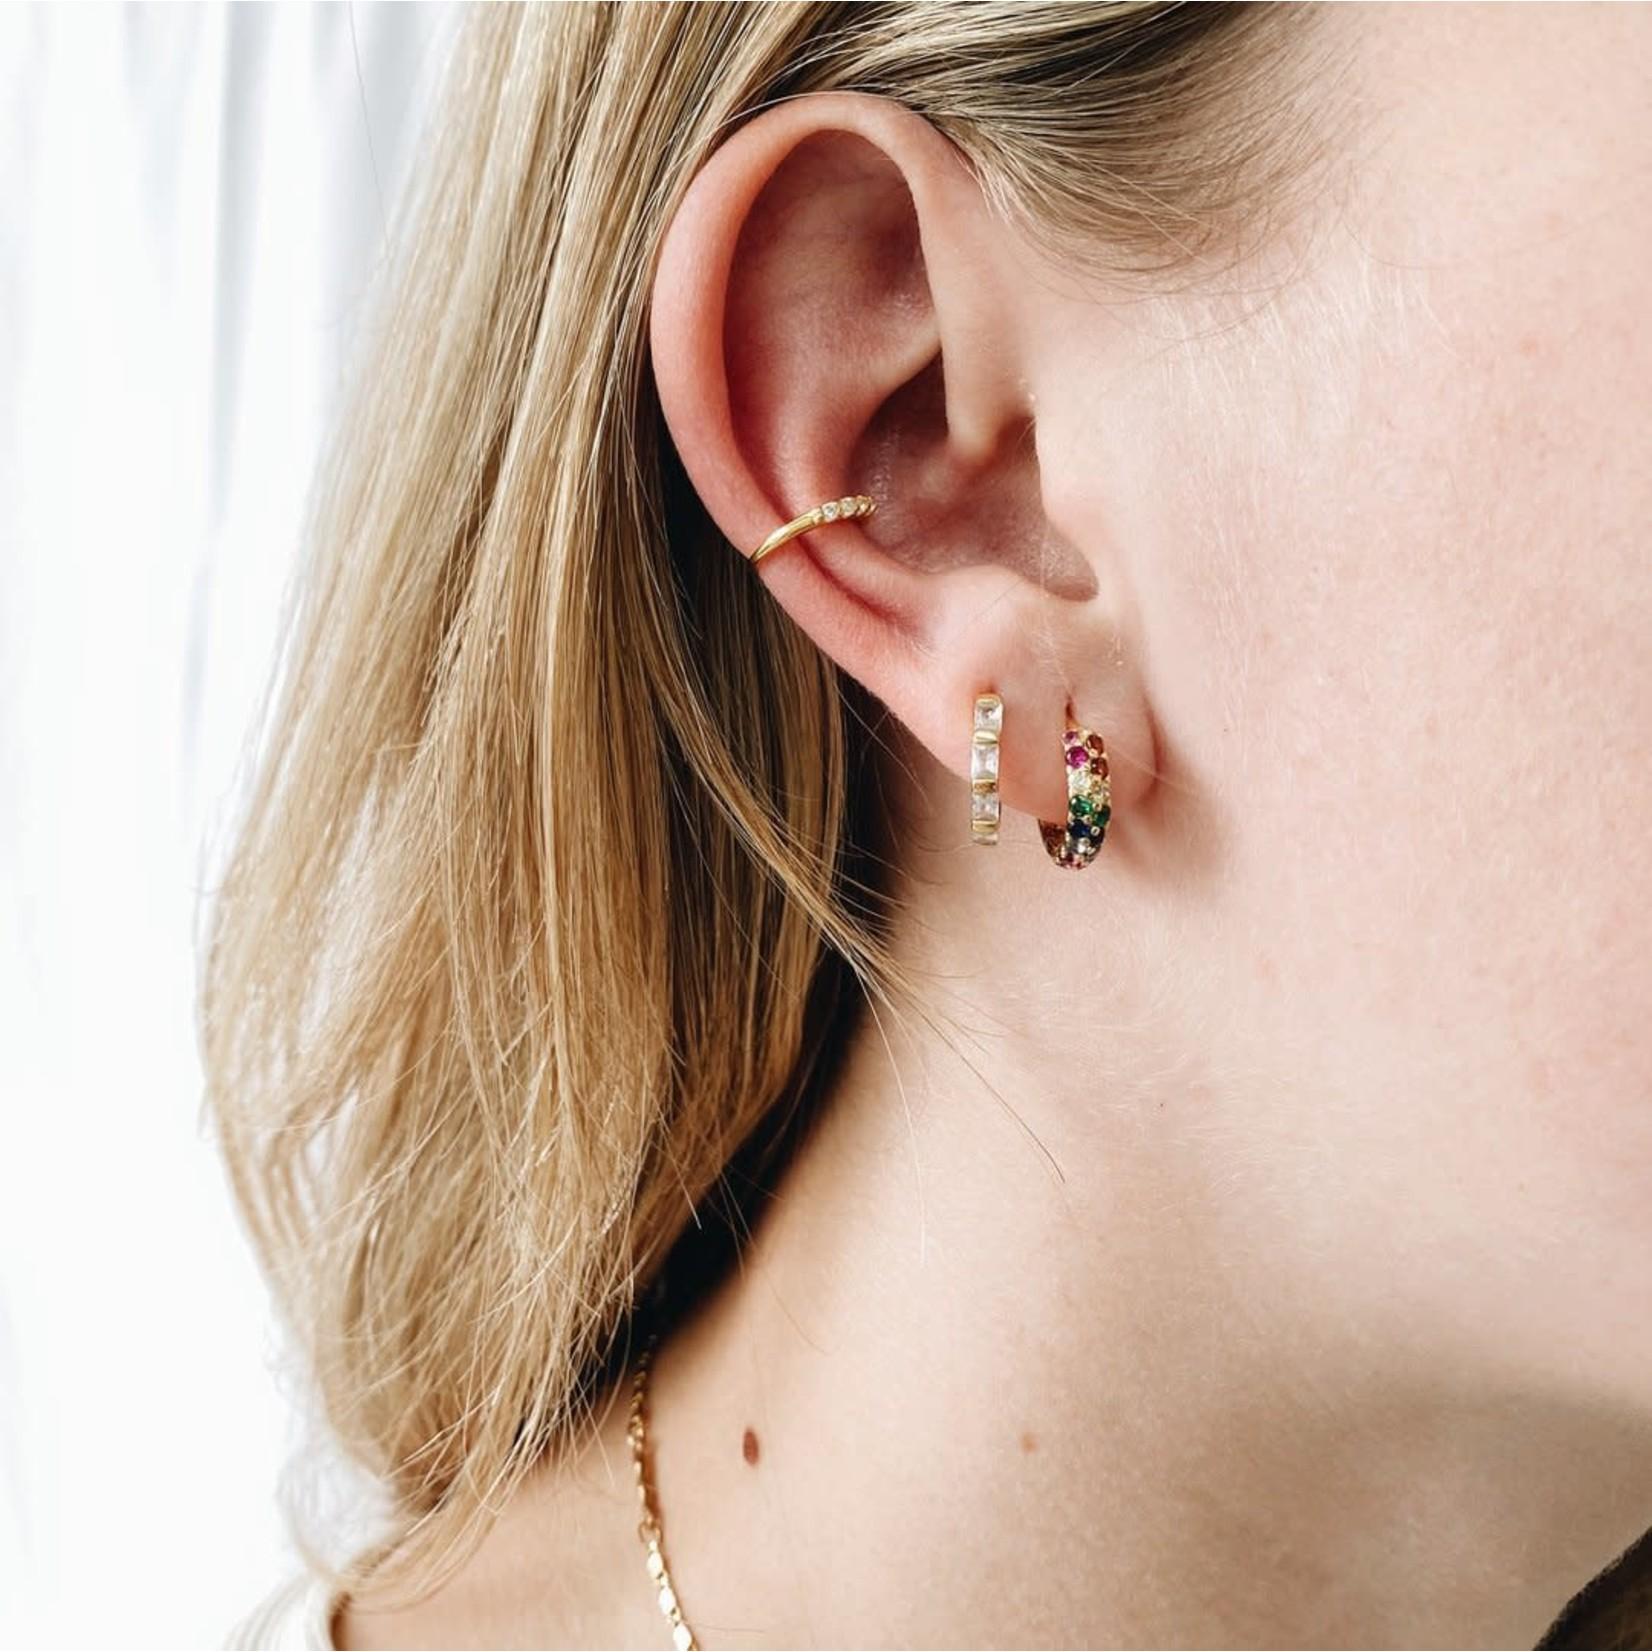 Horace Jewelry Horace fausse boucle d'oreille ZIRCON OR